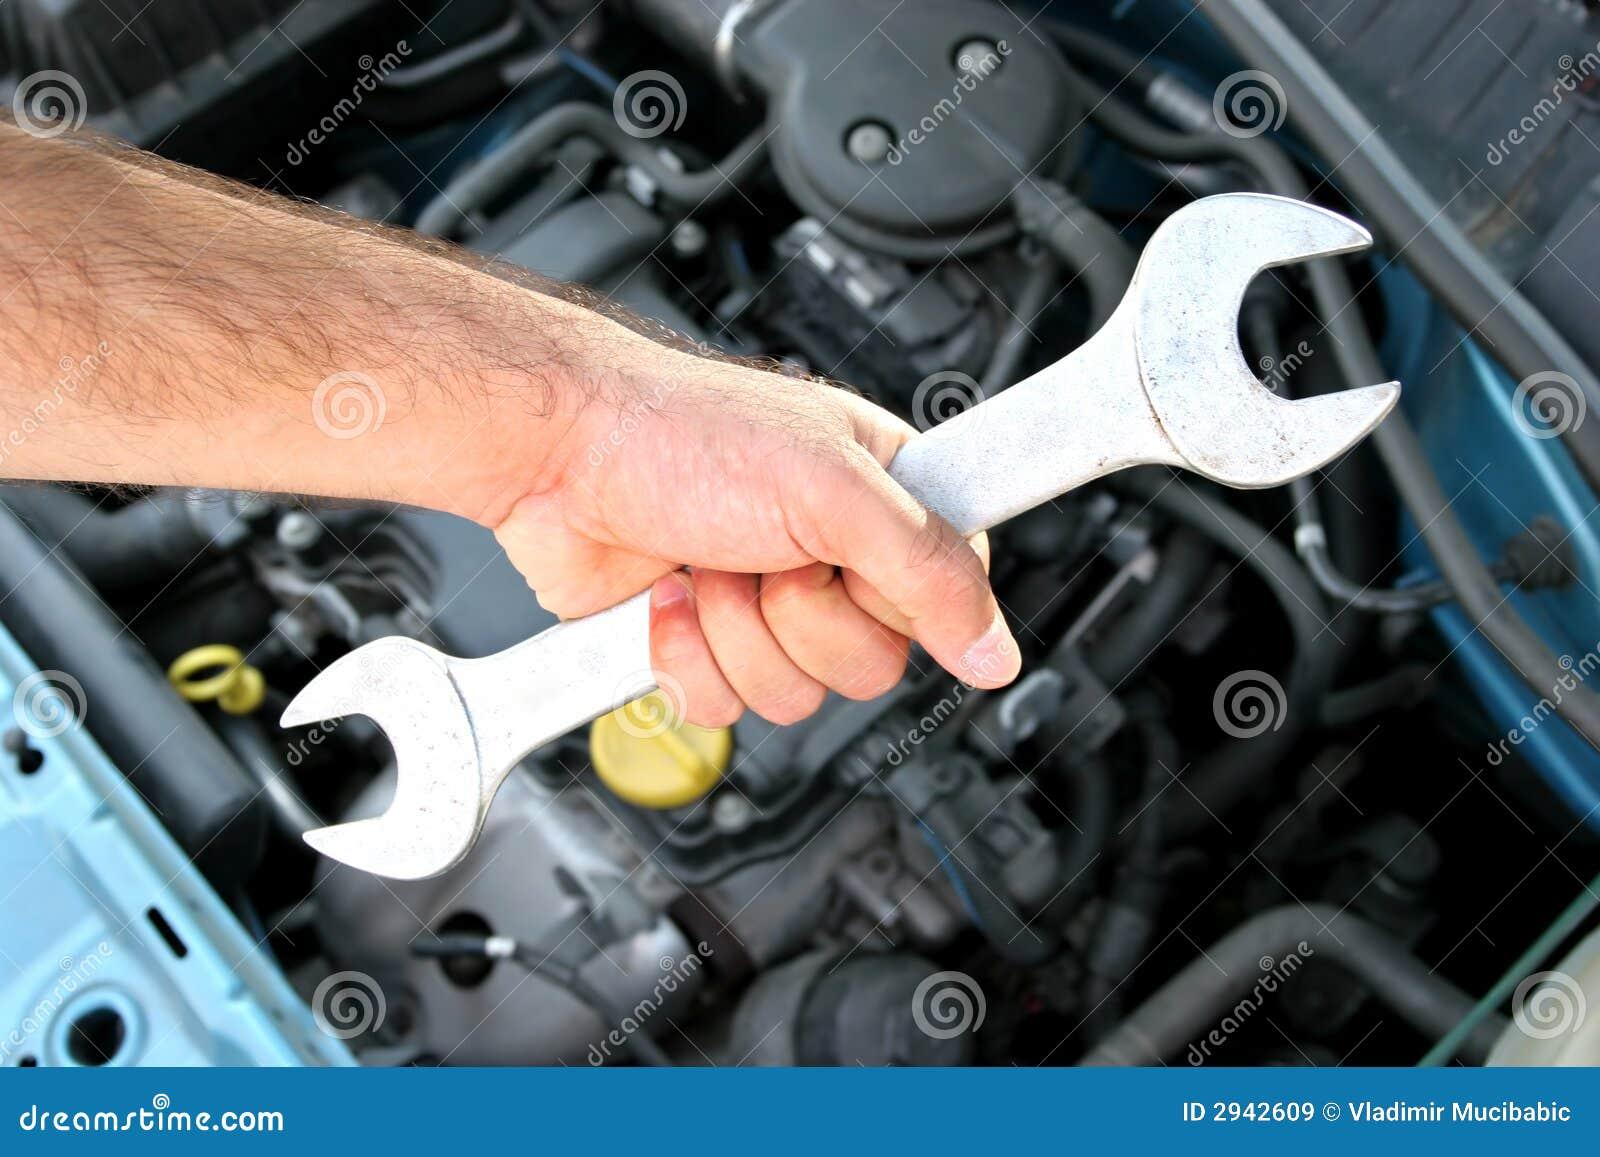 Maintenance a car